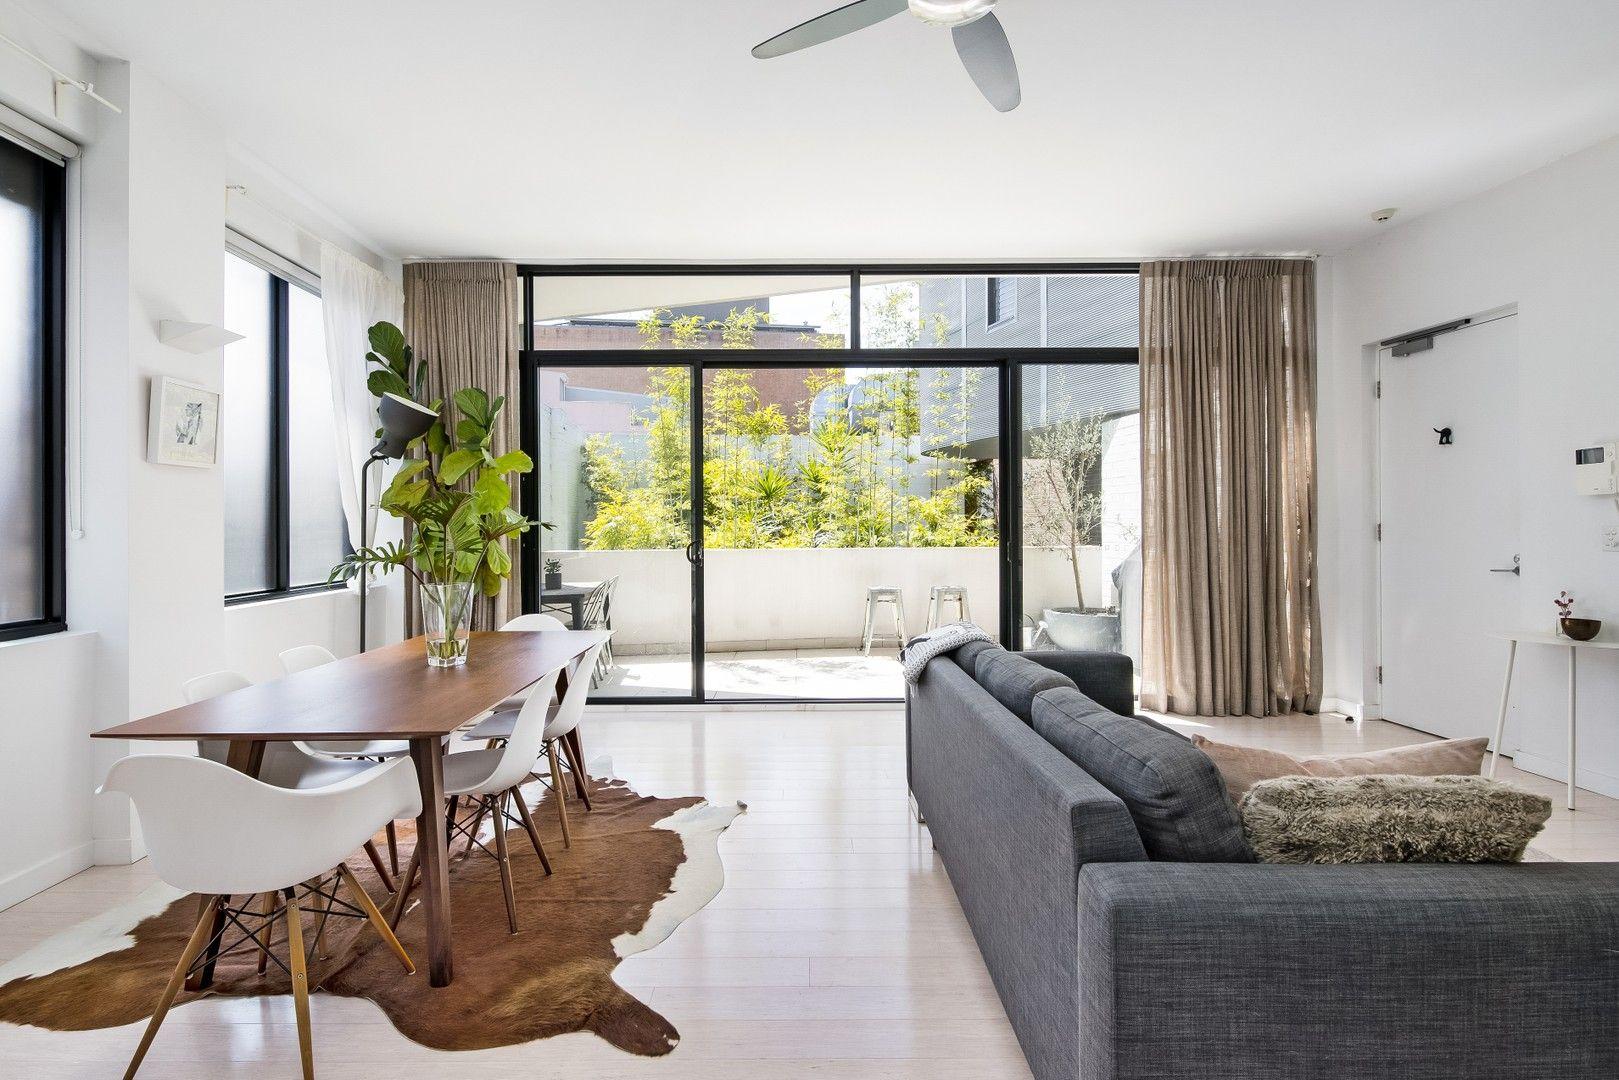 1 bedrooms Apartment / Unit / Flat in 9/86 Cope Street WATERLOO NSW, 2017